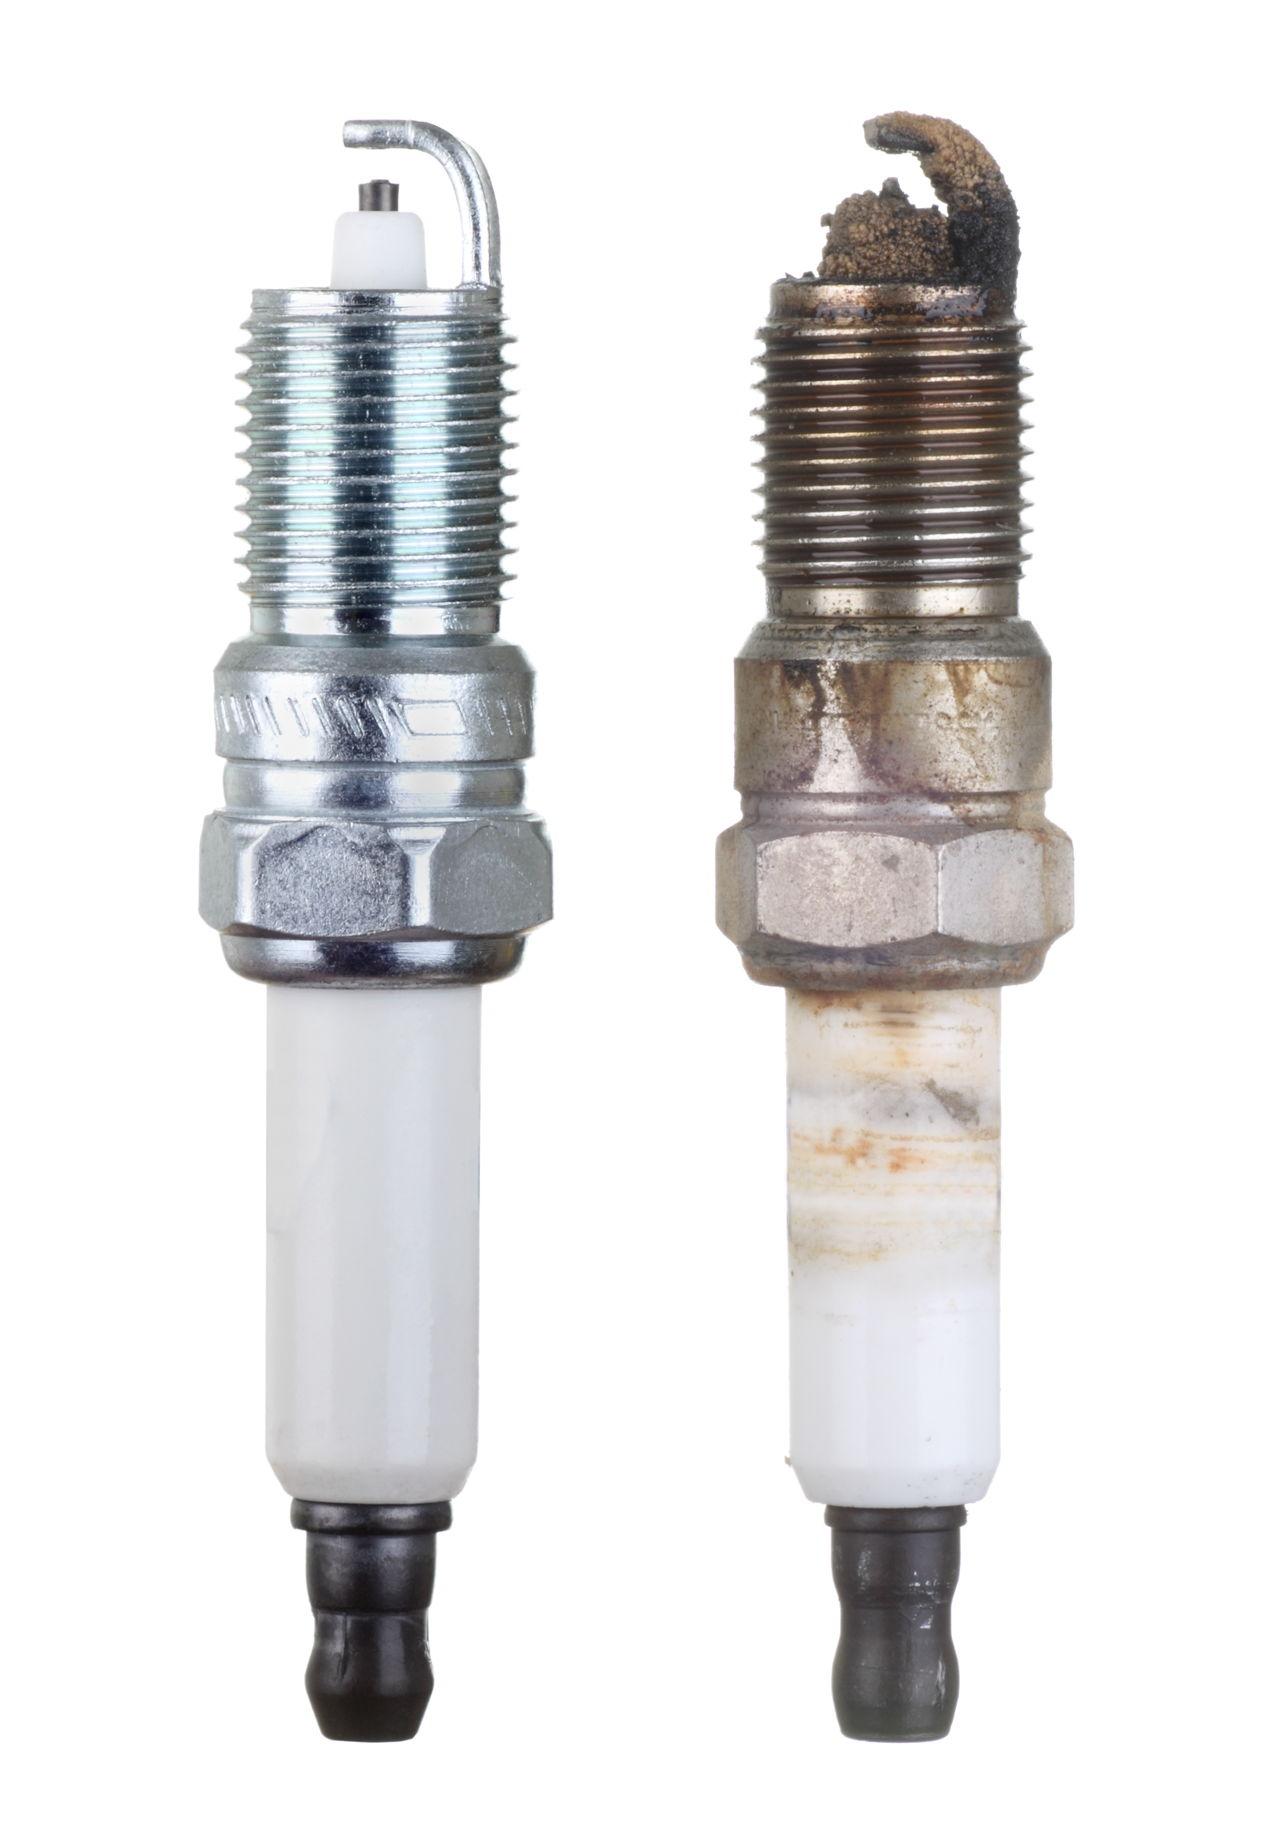 Symptoms Of A Bad Fuel Pressure Regulator 1991 Lumina Filter Location Two Spark Plugs